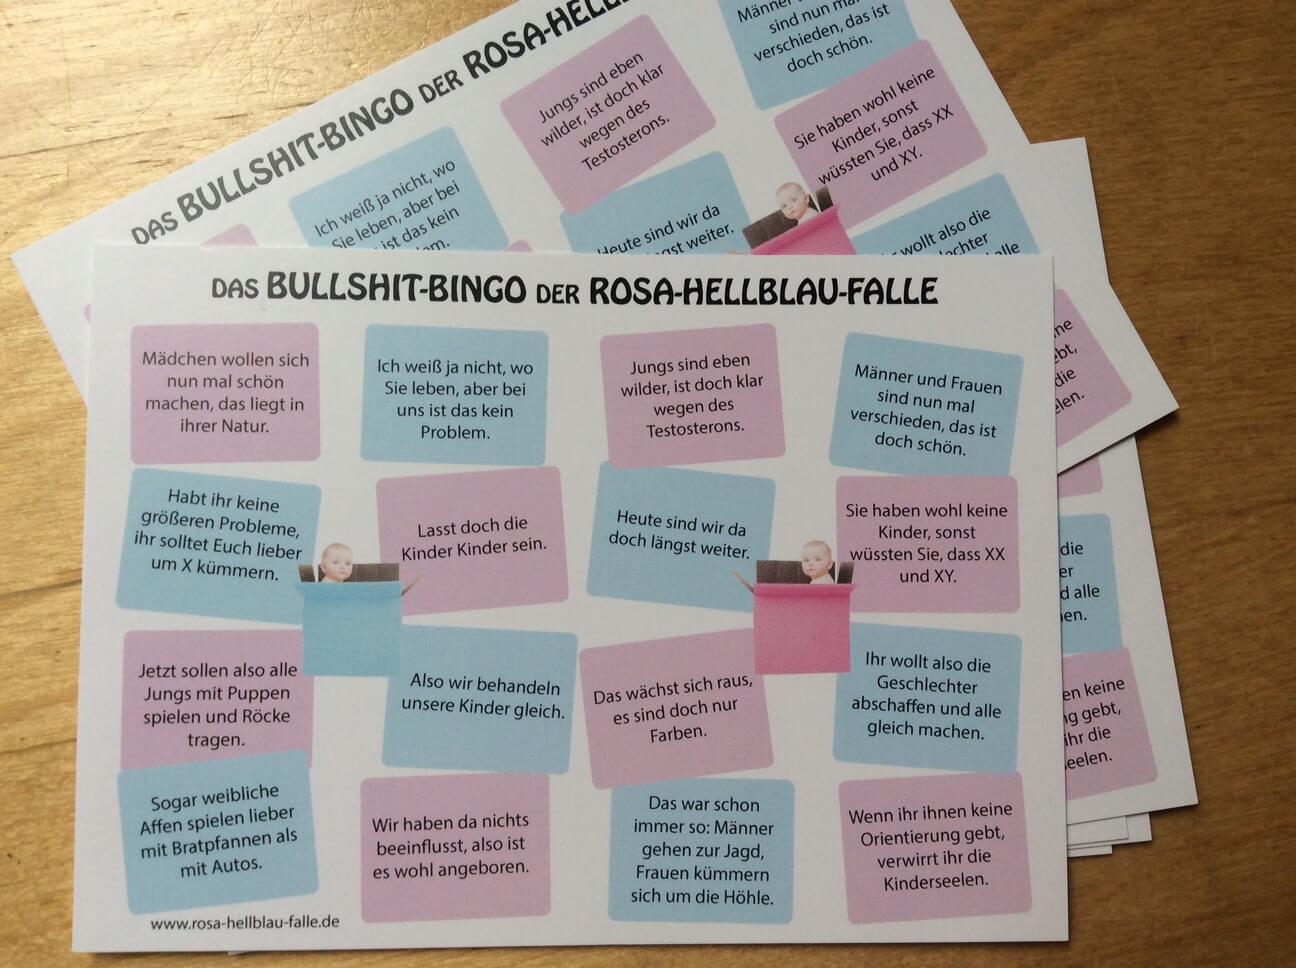 Das Bullshitbingo der Rosa-Hellblau-Falle